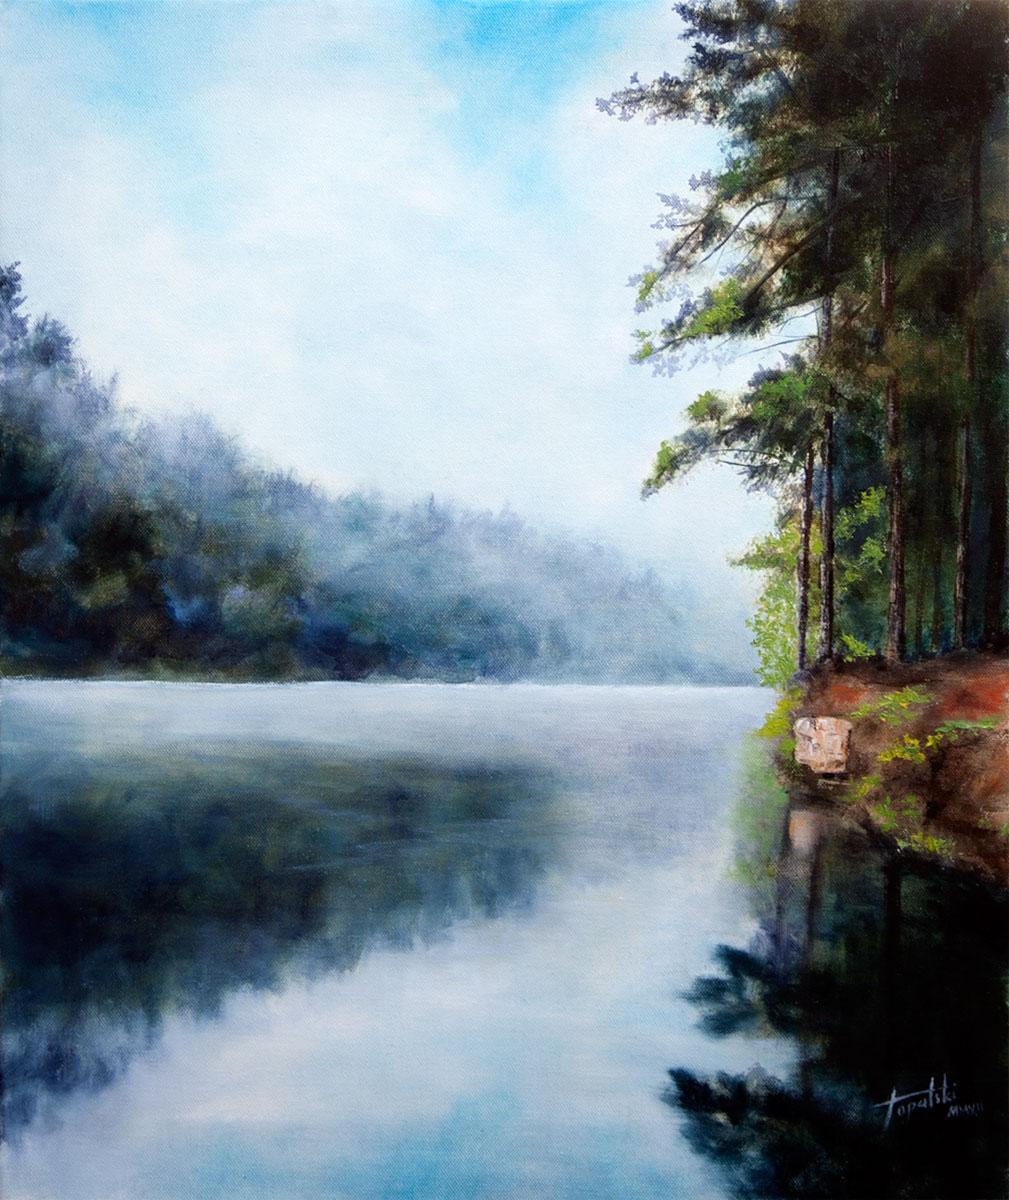 Misty river original oil painting on canvas fine art by artist darko topalski